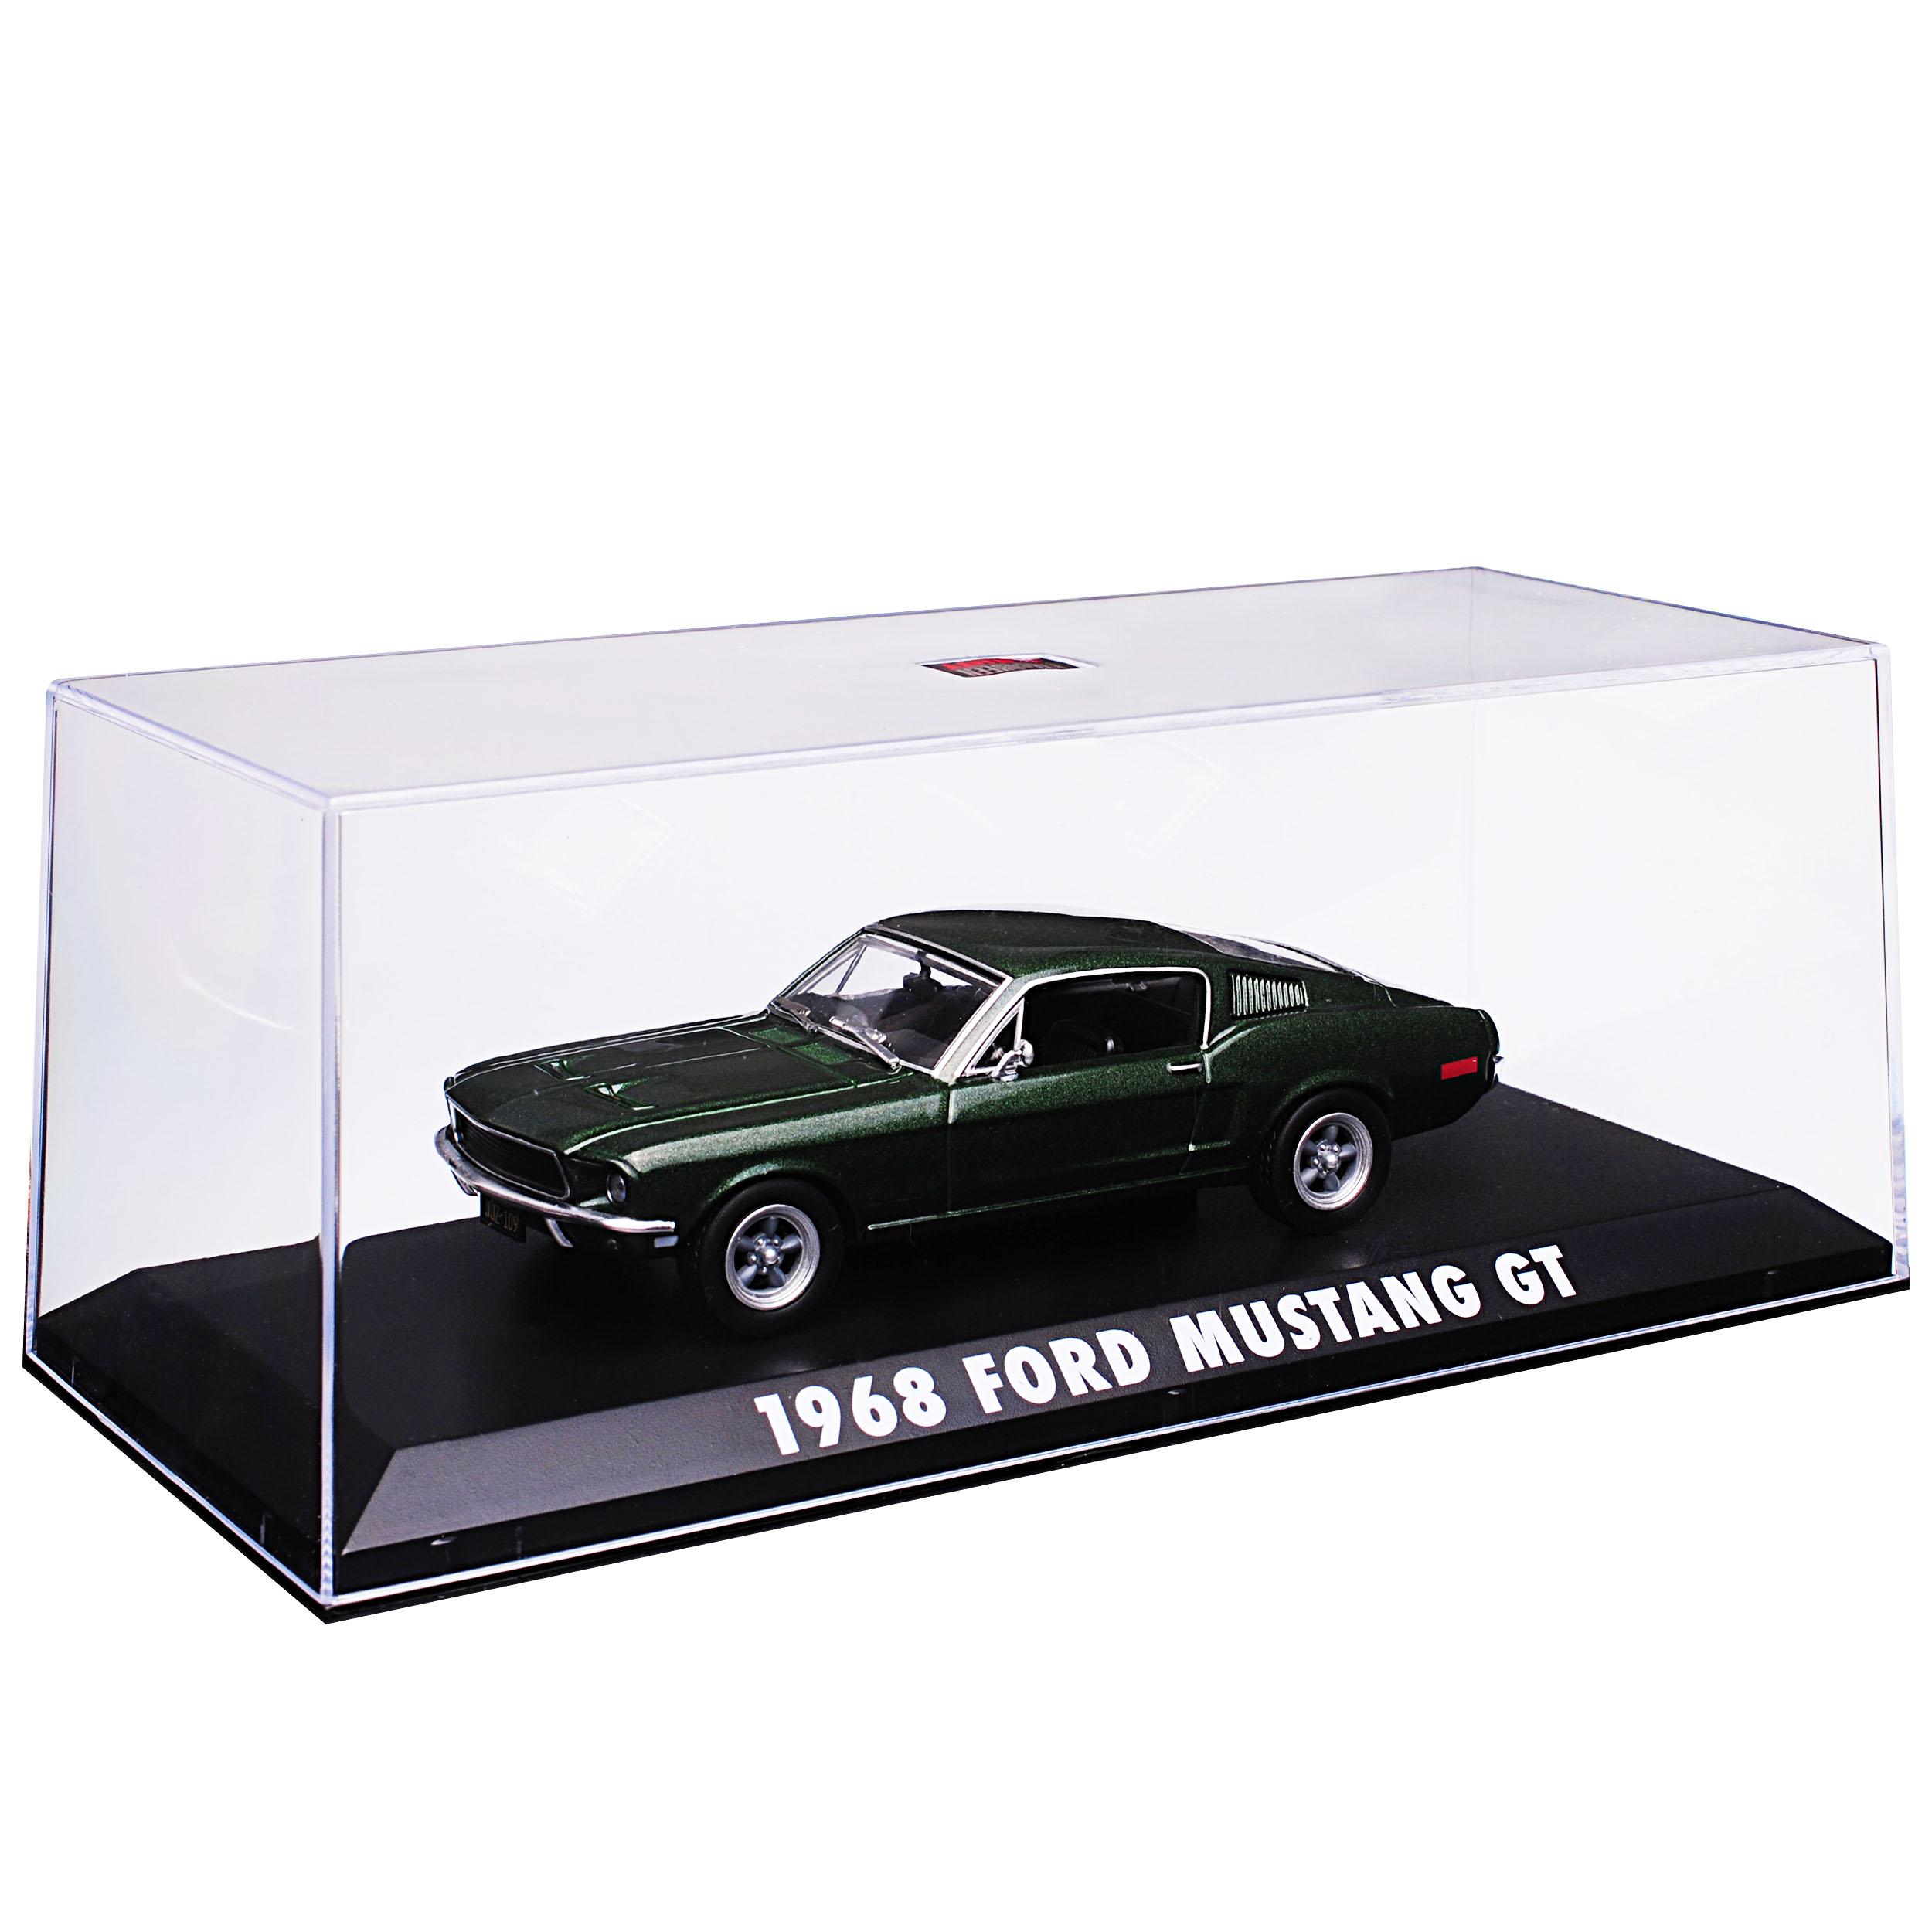 Ford Mustang Bullitt verde Coupe con personaje steve mcqueen 1968 1//43 GreenLight M..